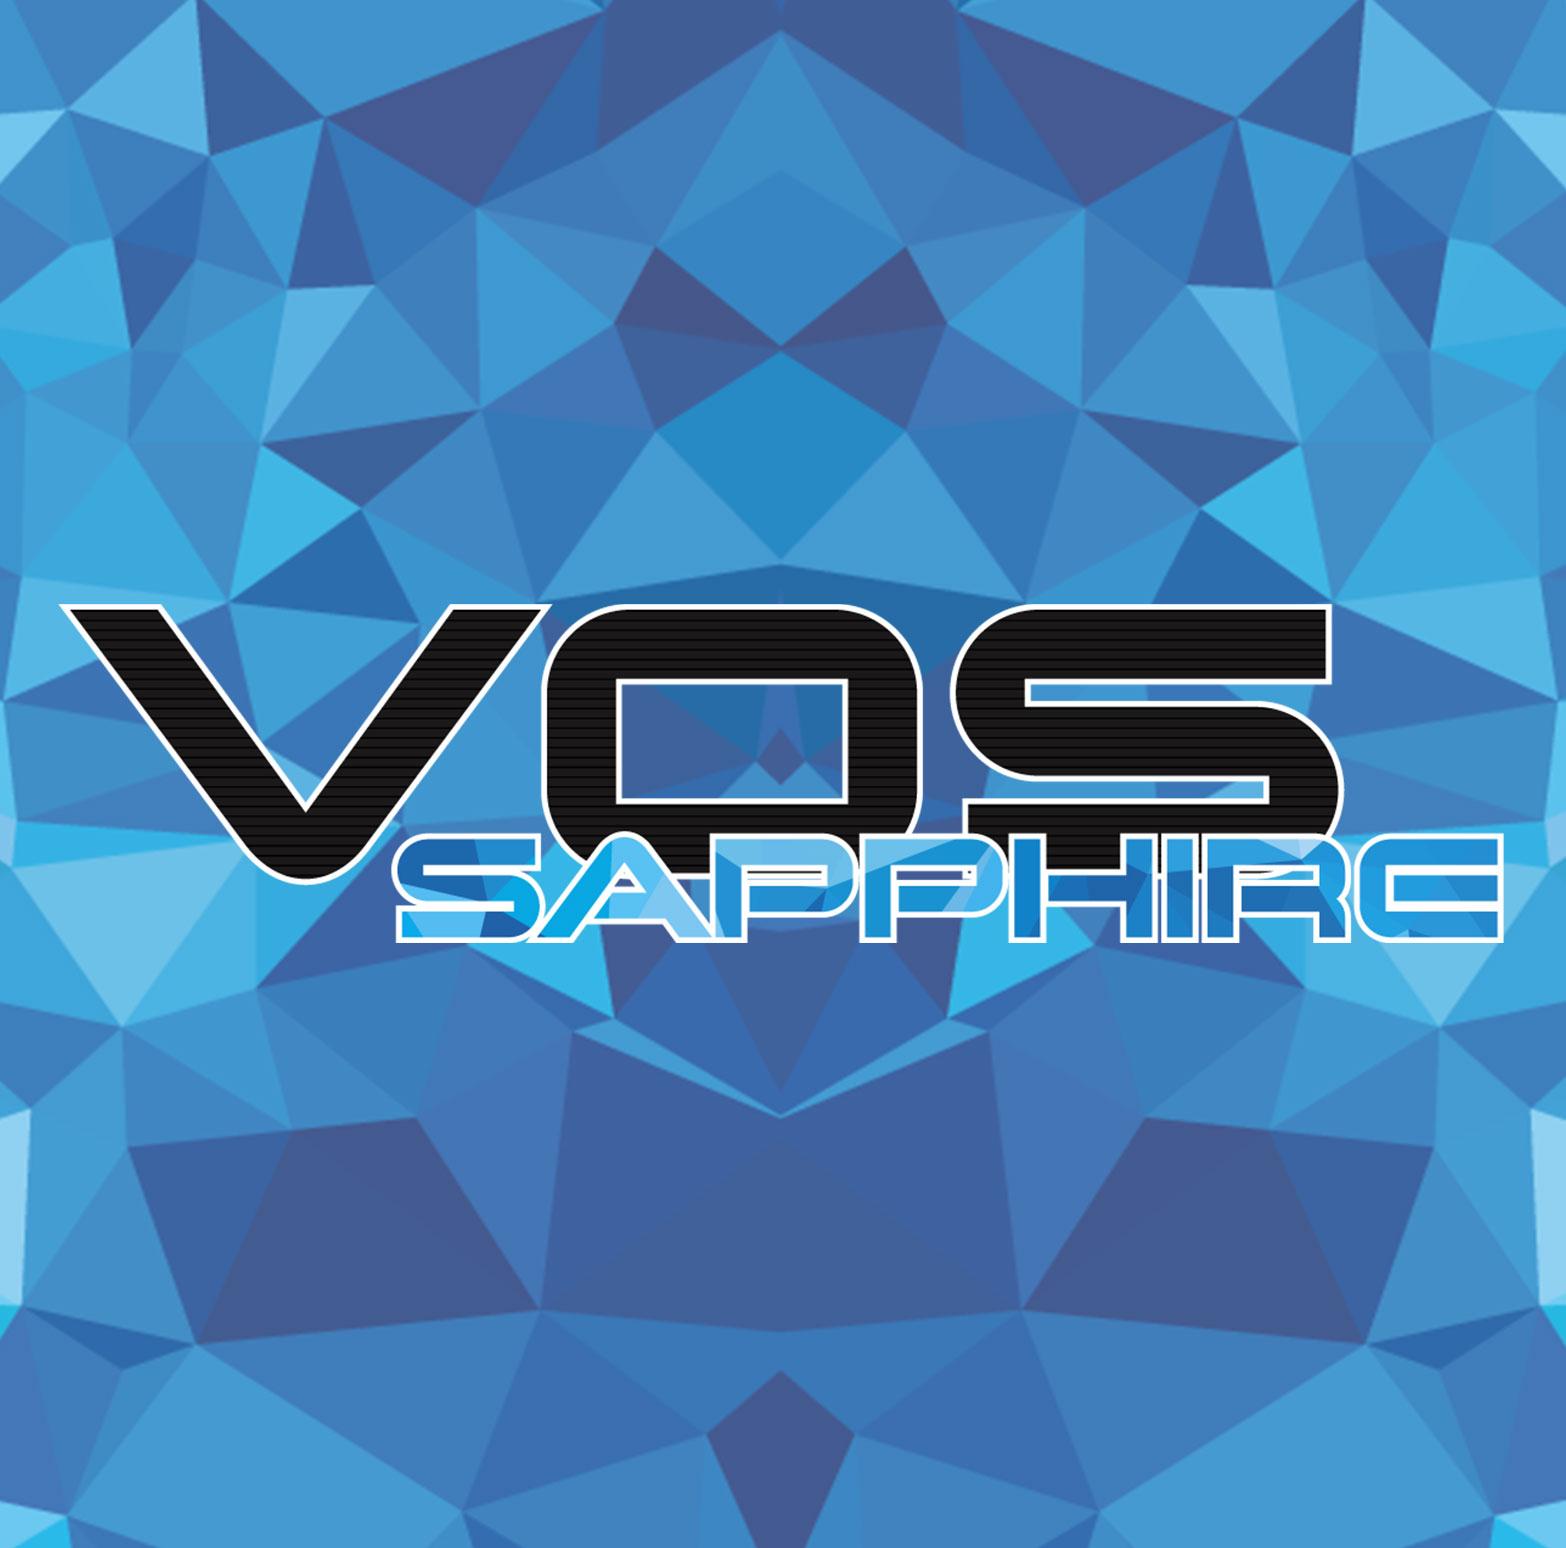 VOS-Sapphire-Image